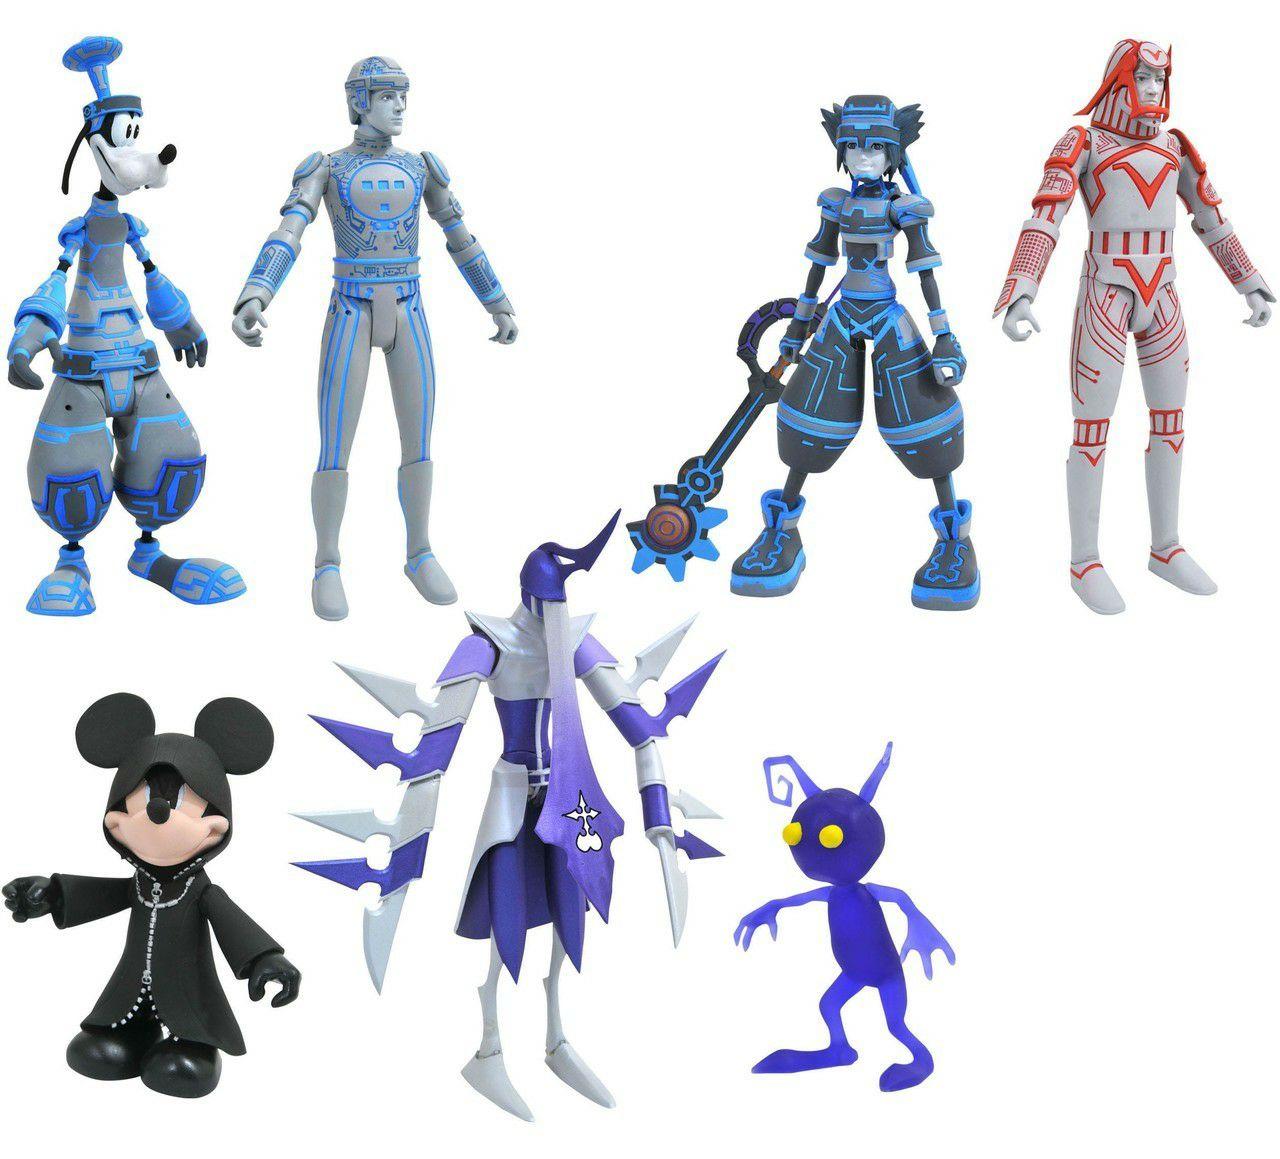 [Lokal] Gamestop Disney Kingdom Hearts Series 3 Mickey with Shadows, Goofy with Tron & Shadow & Sora with Donald & Sark